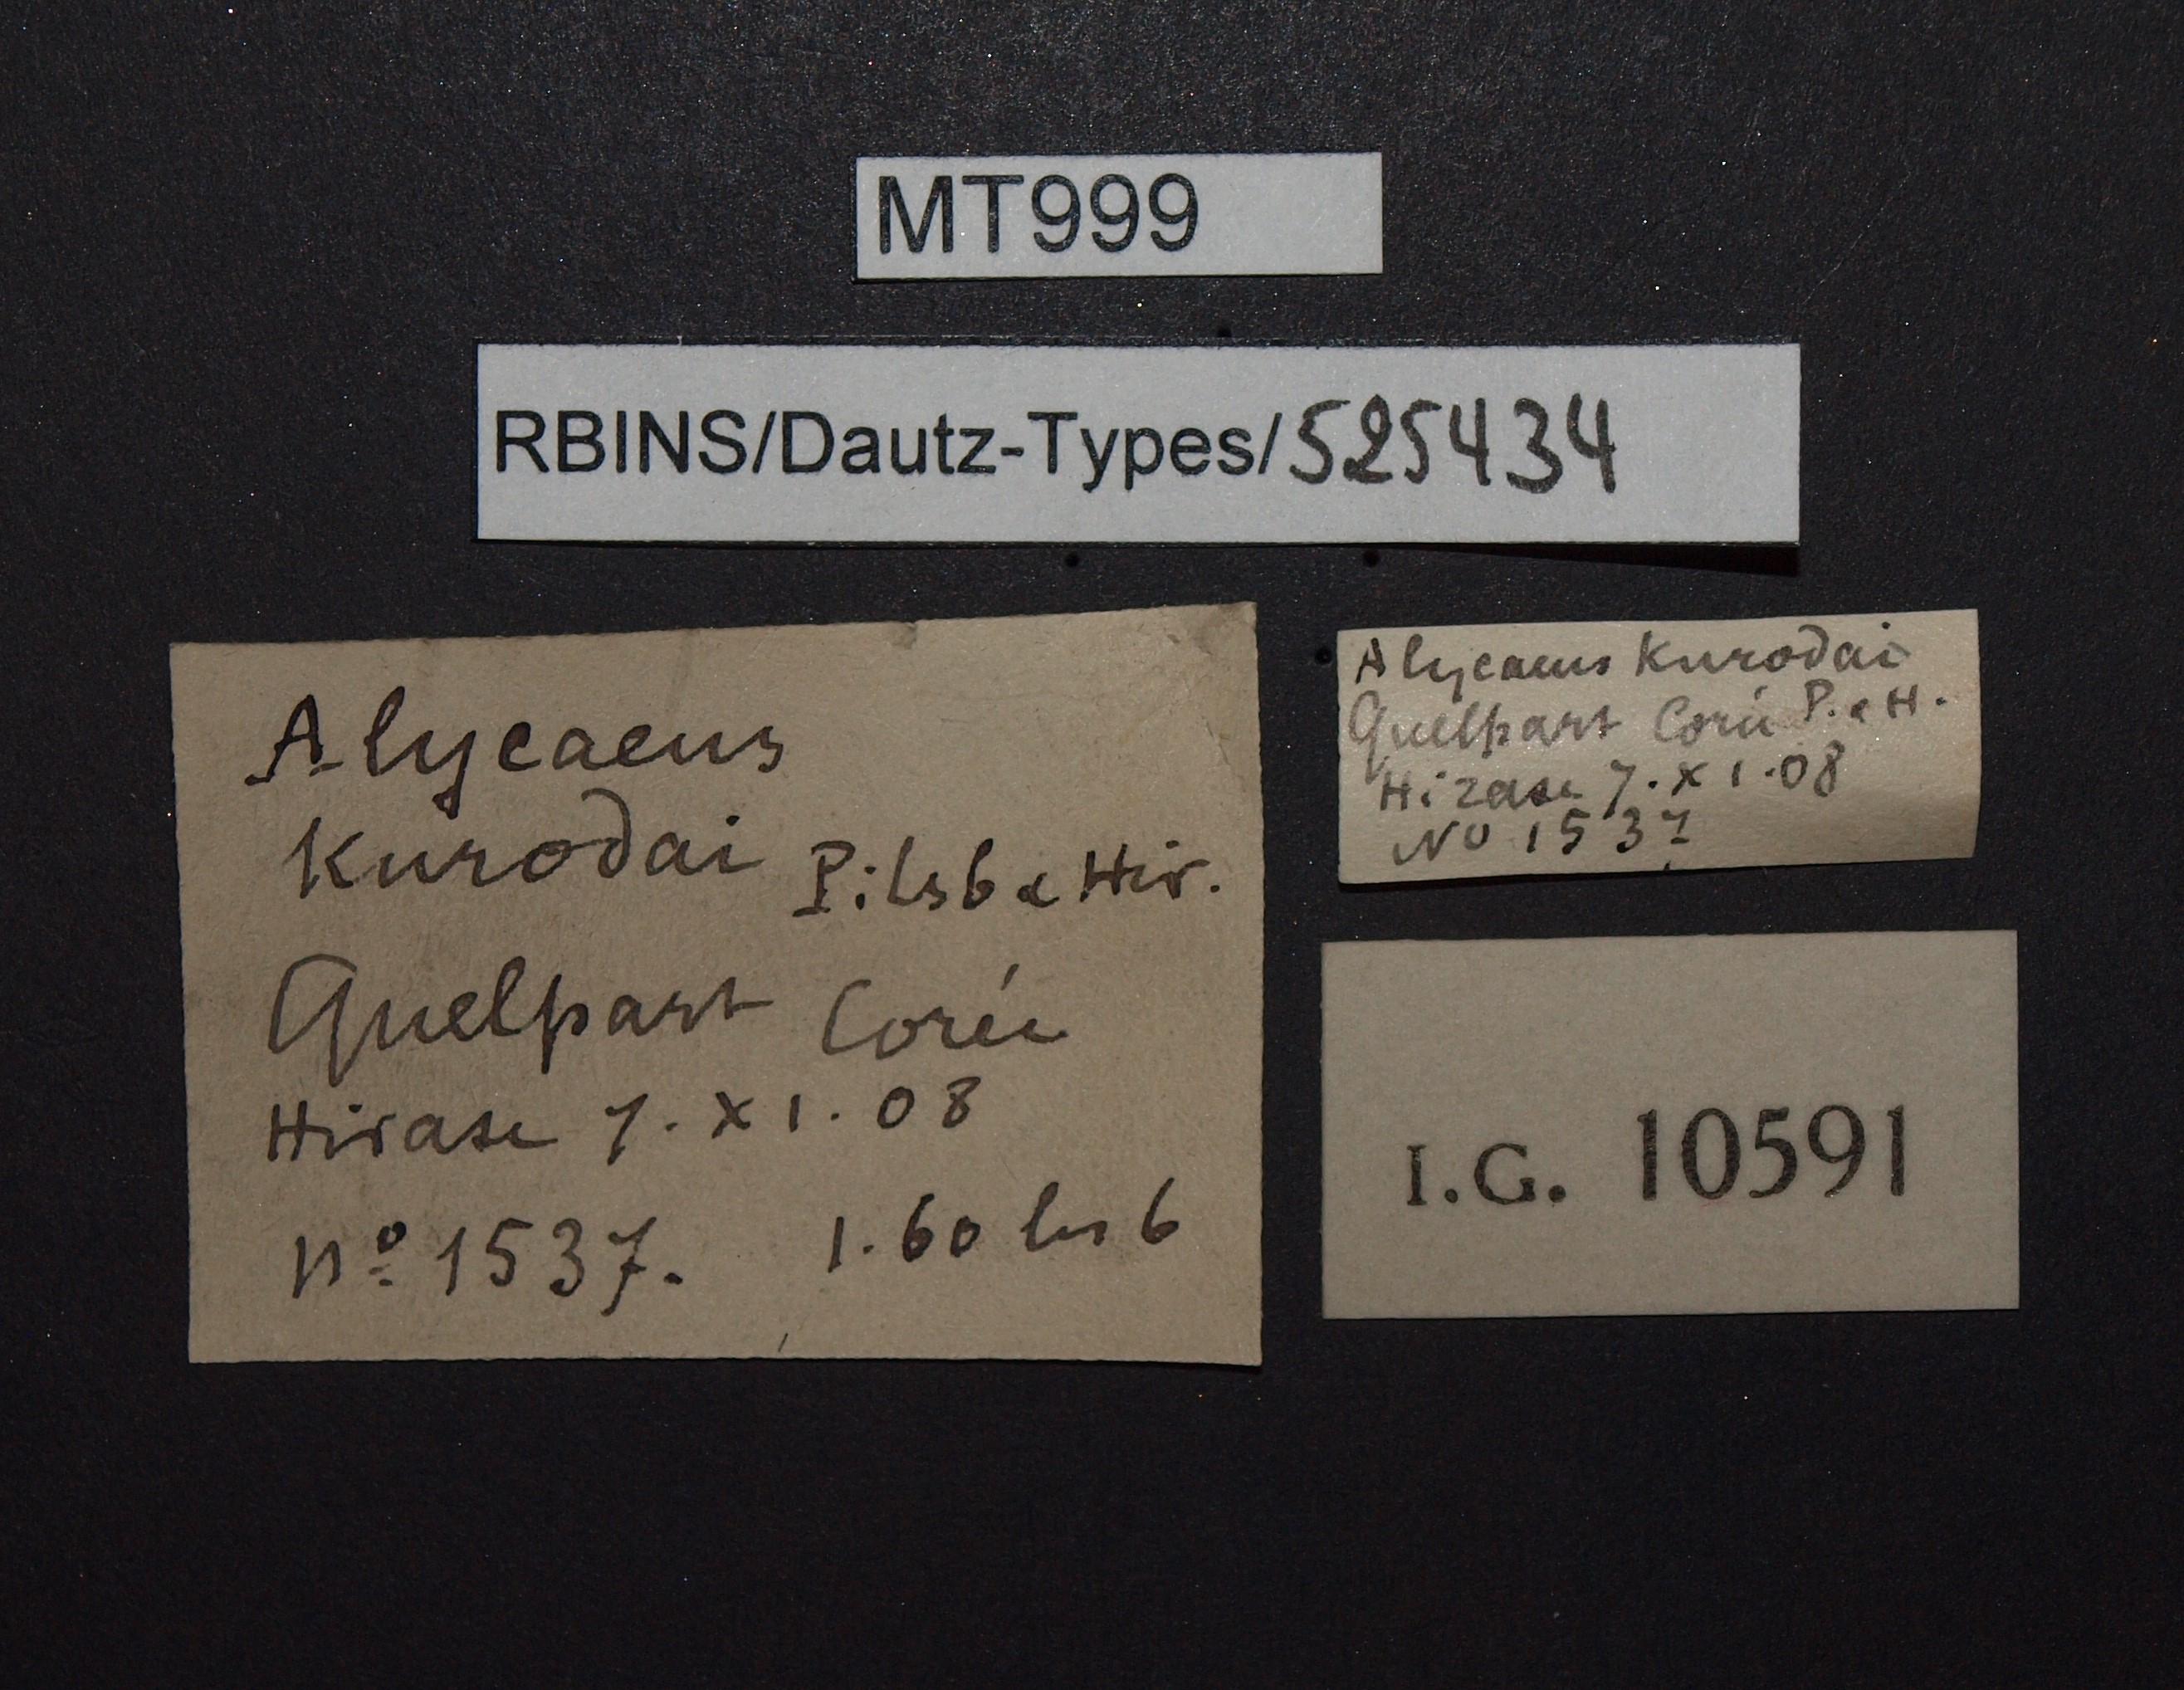 BE-RBINS-INV MT 999 Alycaeus kurodai pt-Lb.JPG